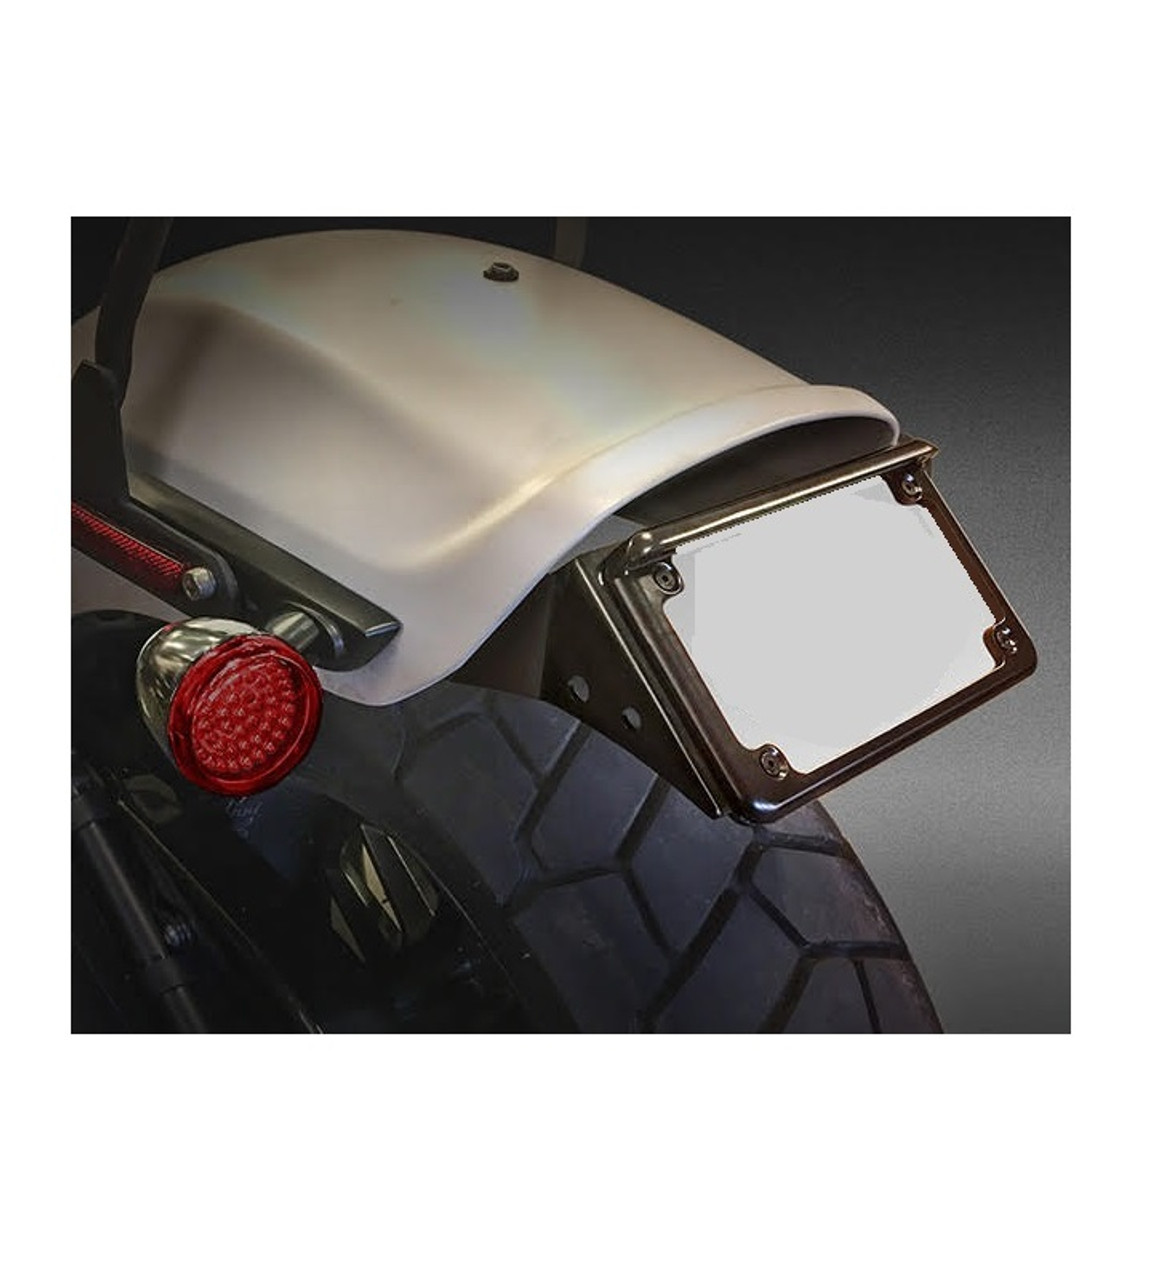 2018 HD Fat Bob Tail Tidy Indicator Relocation LED License Kit